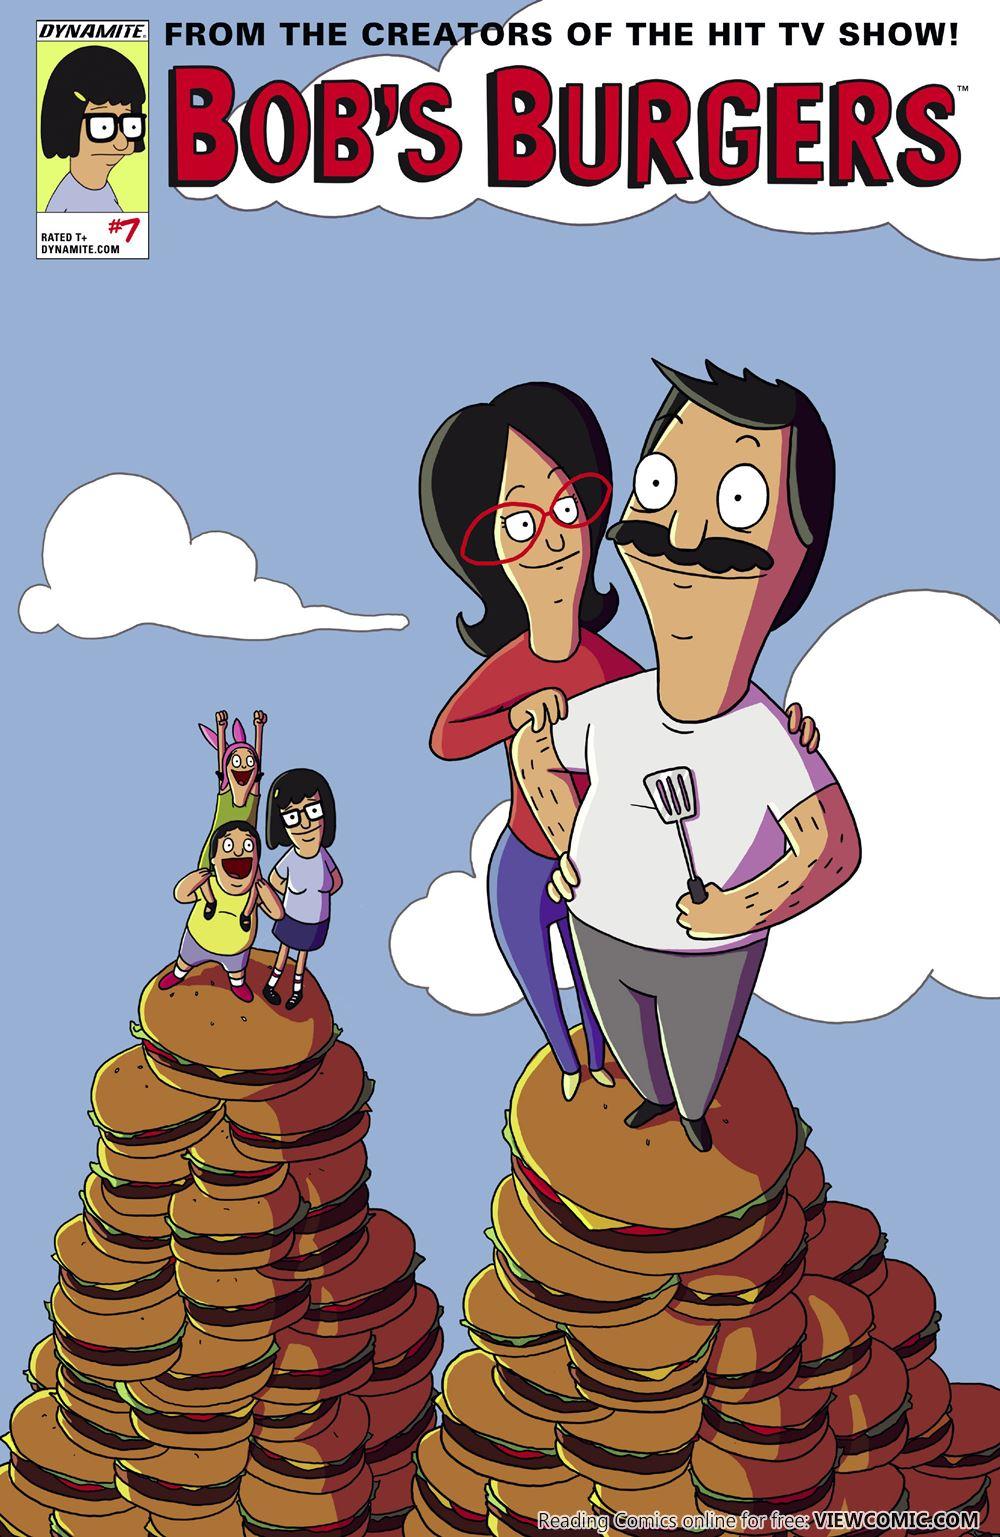 Free Bobs Burgers Porn bob's burgers | viewcomic reading comics online for free 2019